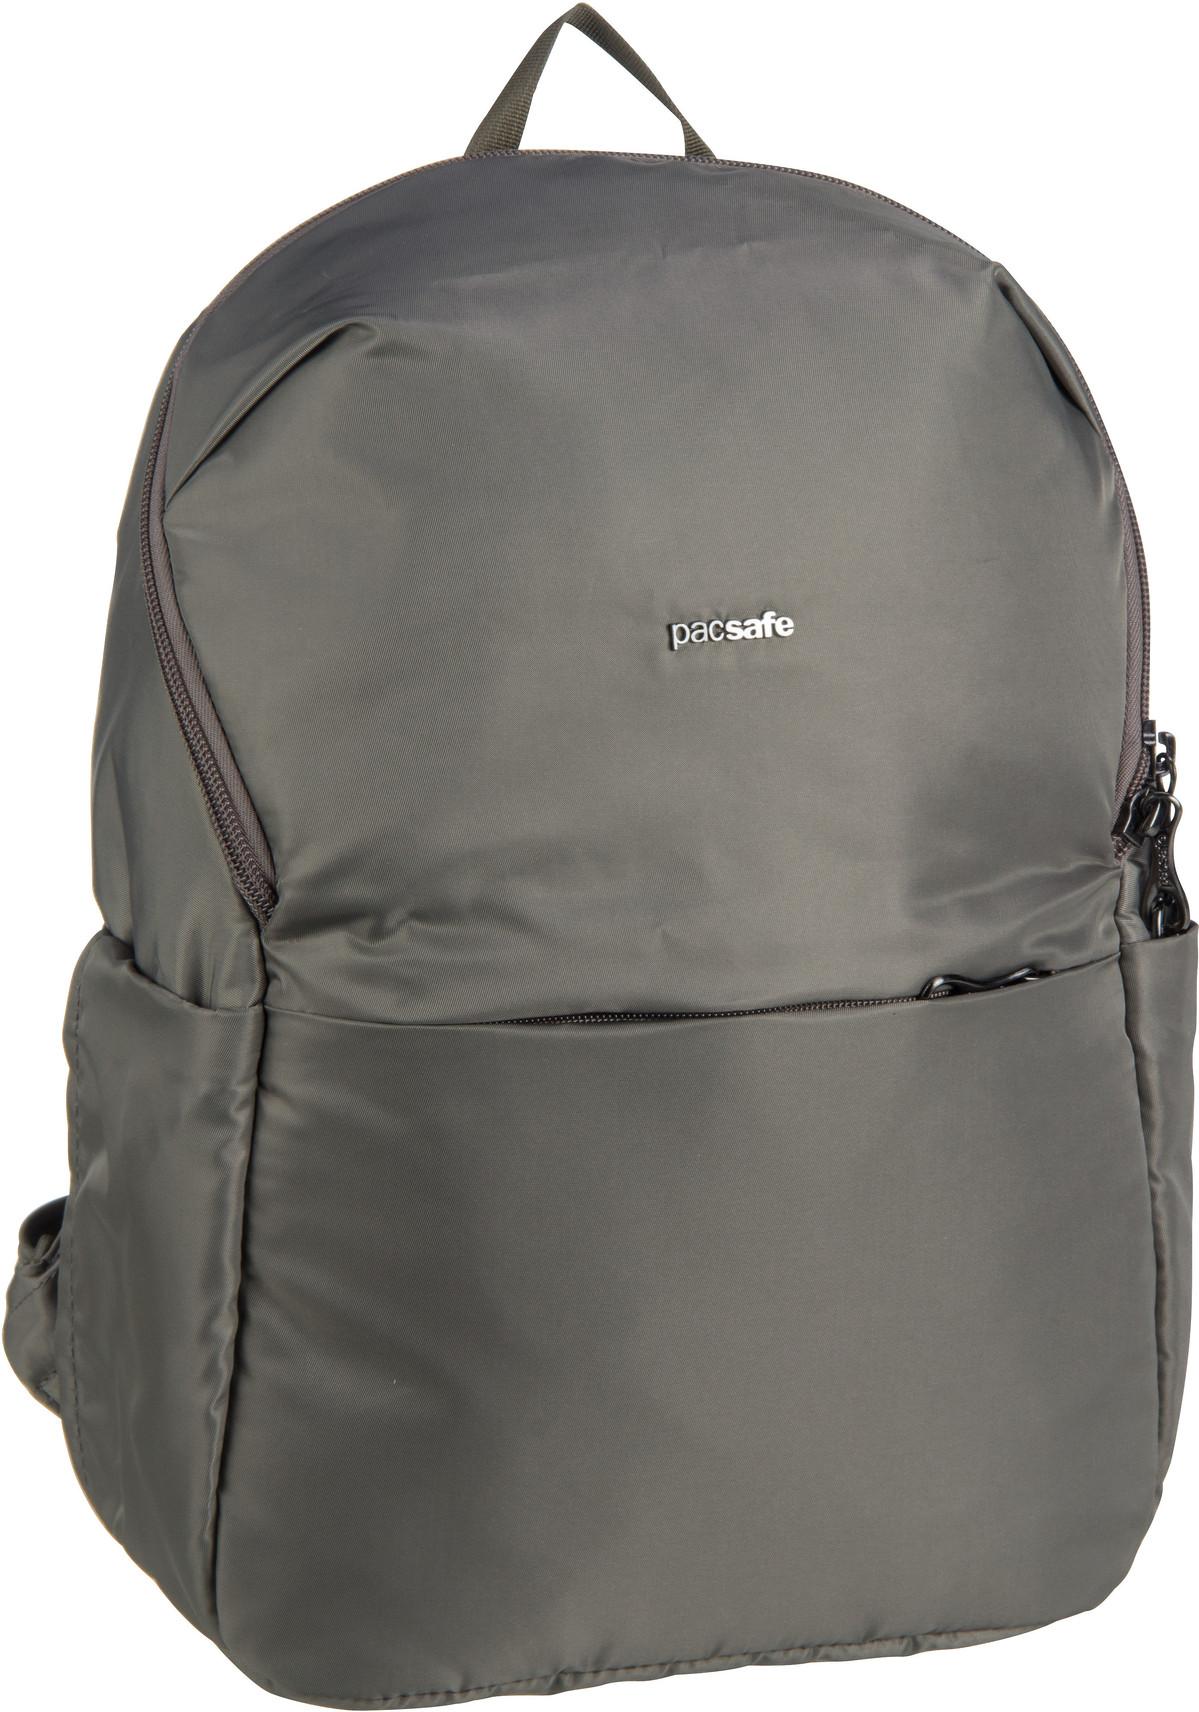 Rucksack / Daypack Cruise essentials Backpack Ashwood (12 Liter)